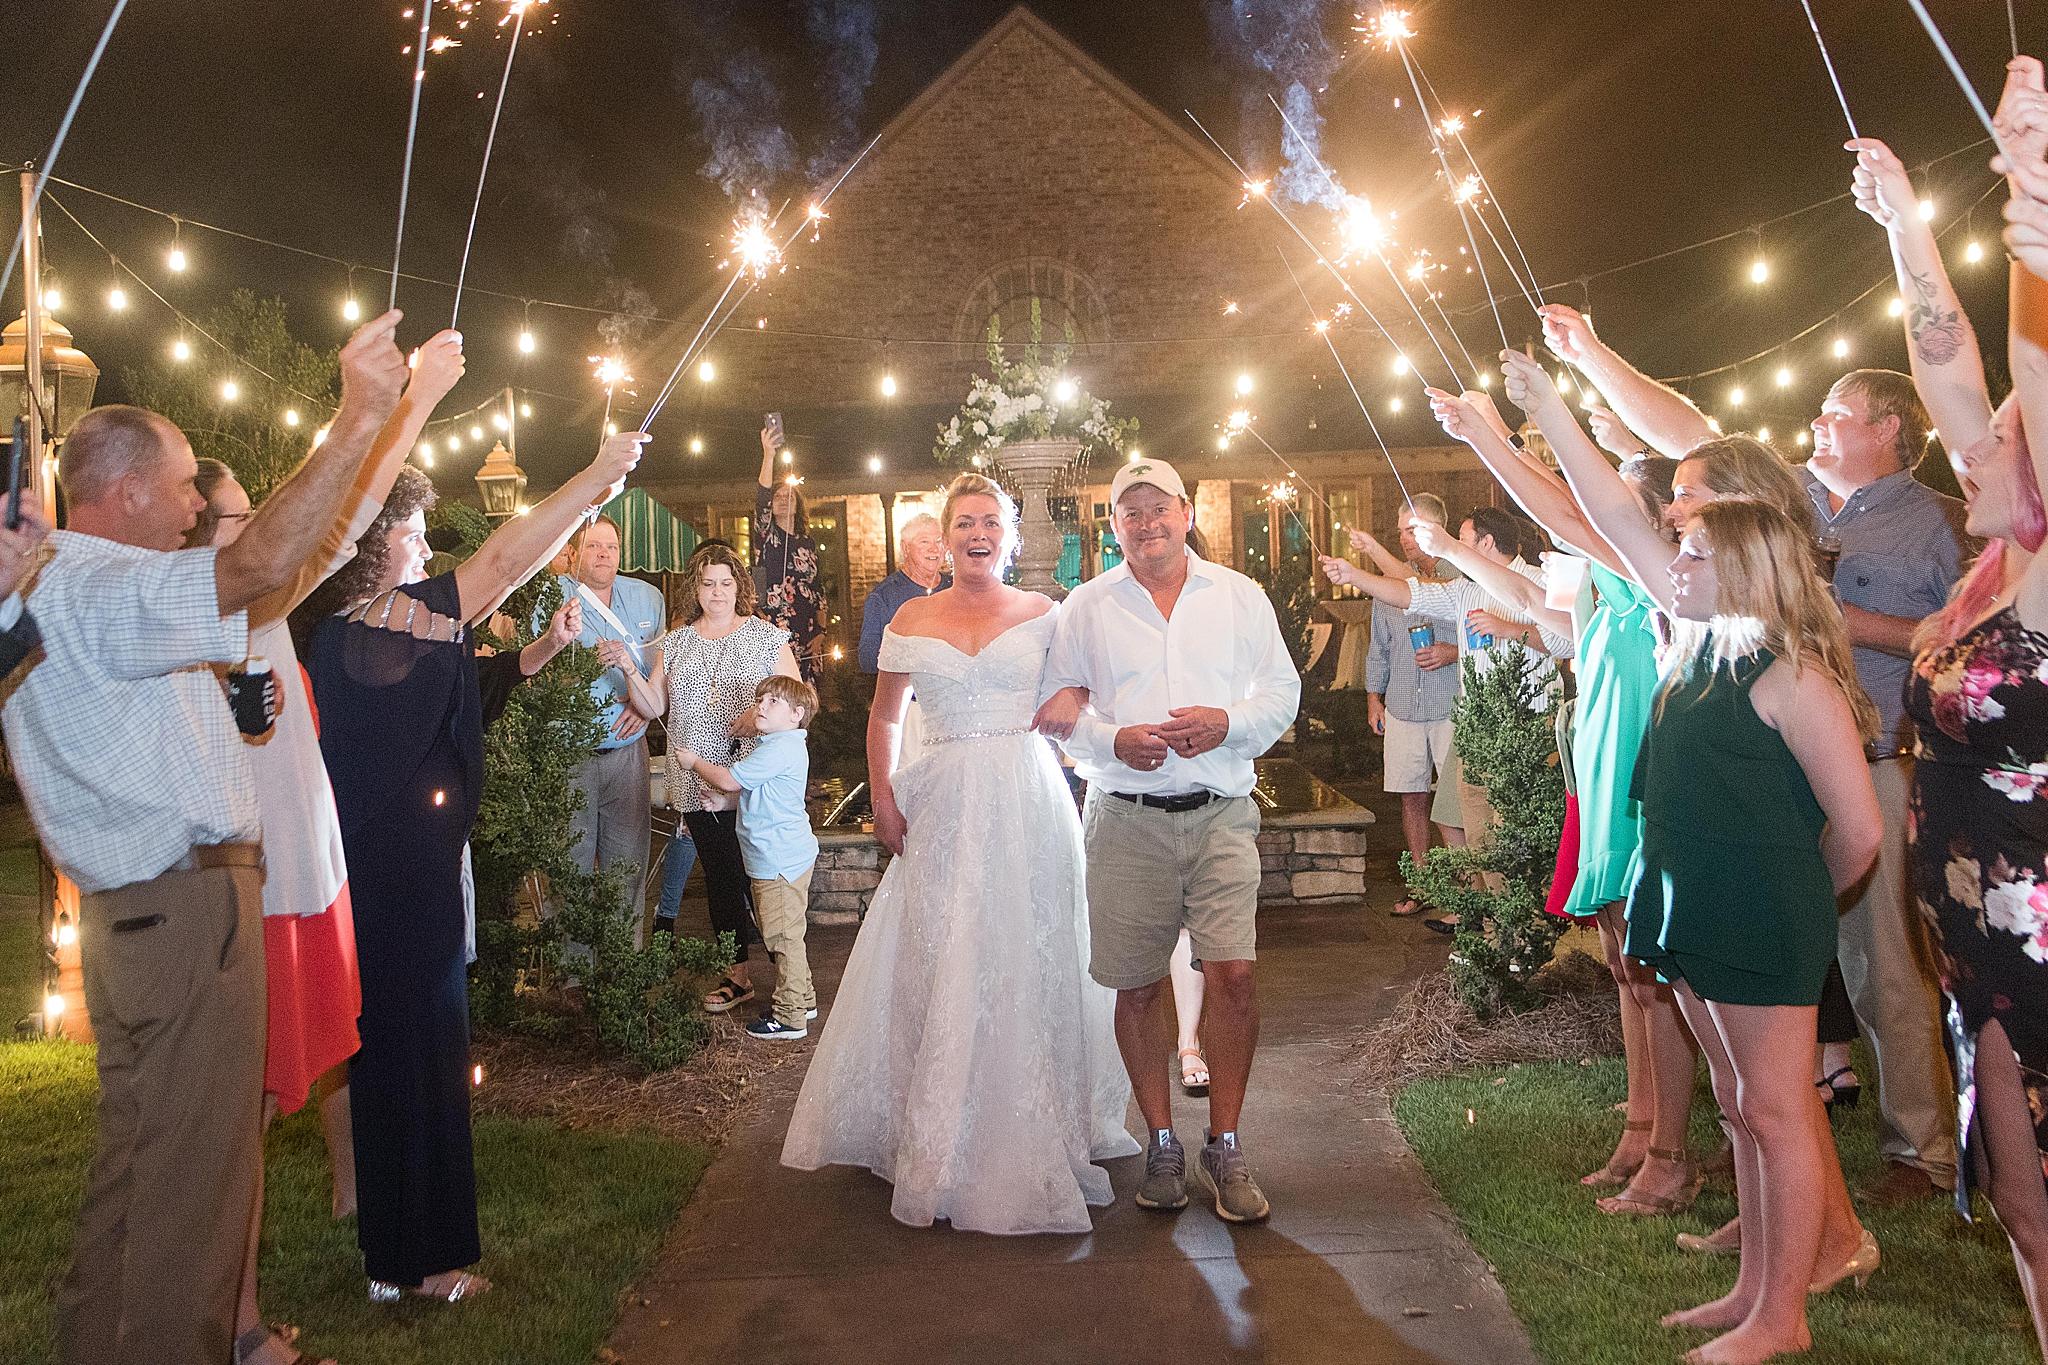 Alabama sparkler exit to end wedding night